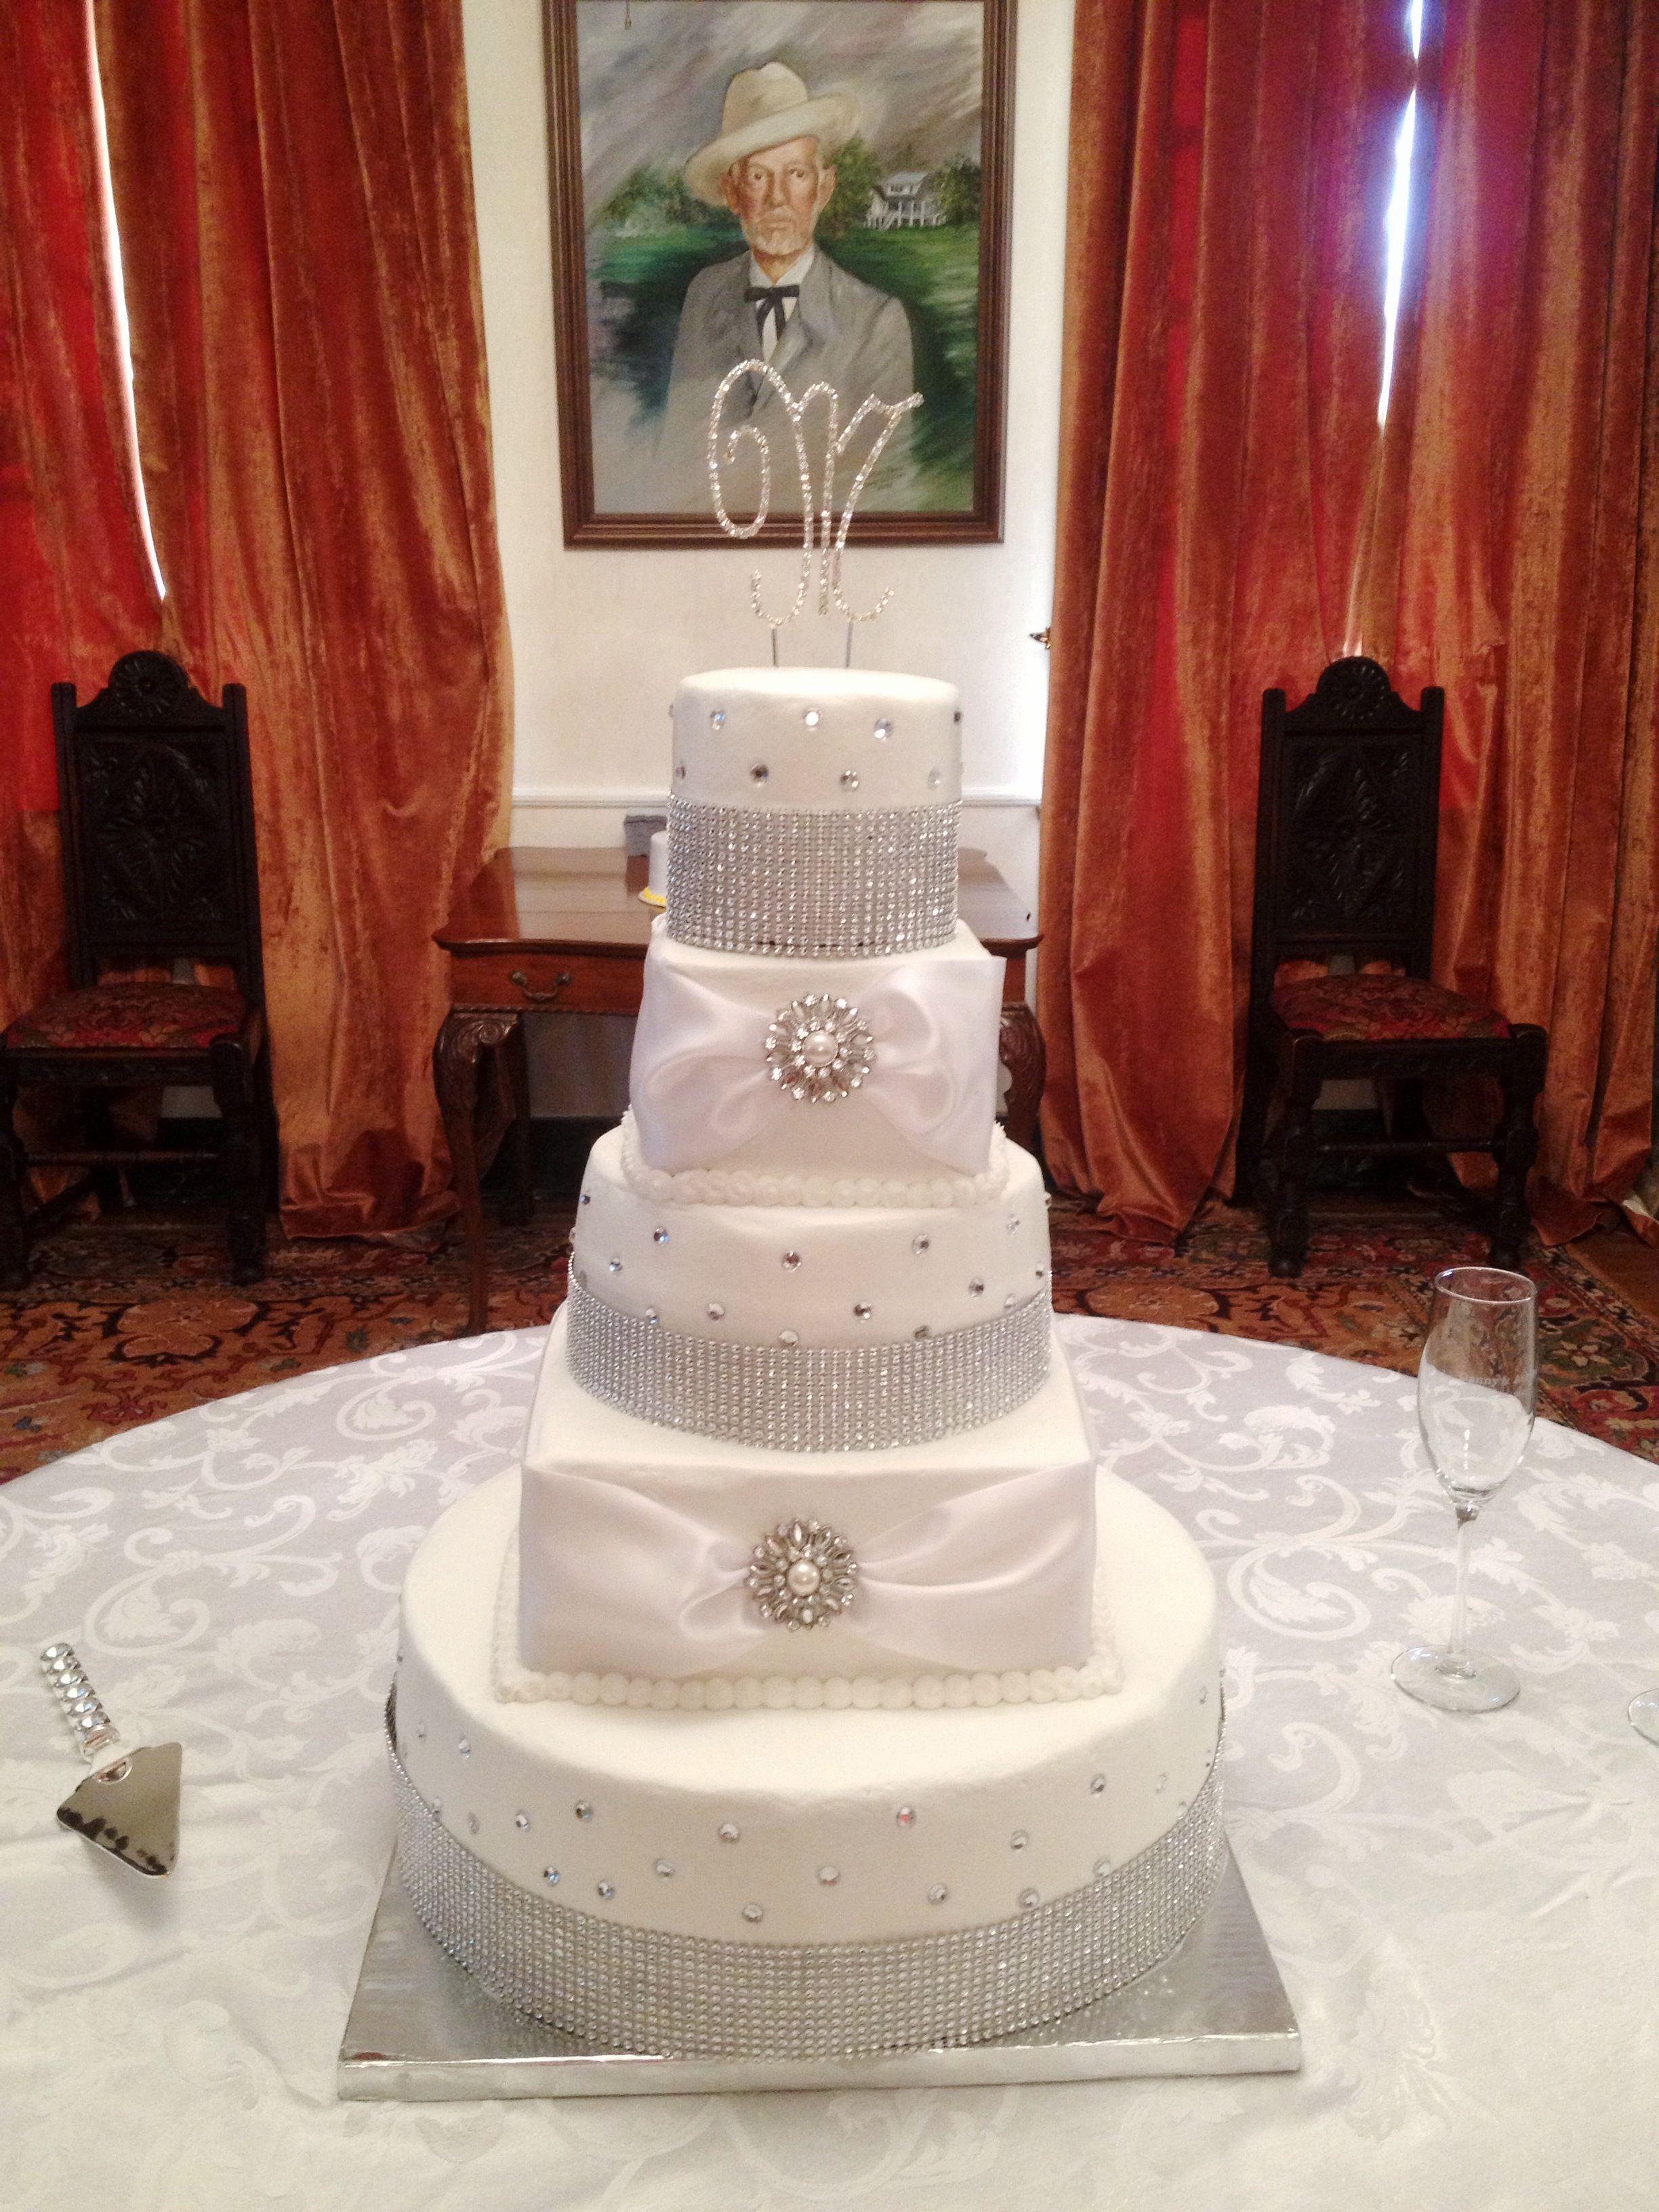 Diamond Wedding Cake Bake Your Day Llc Alexandria La Www